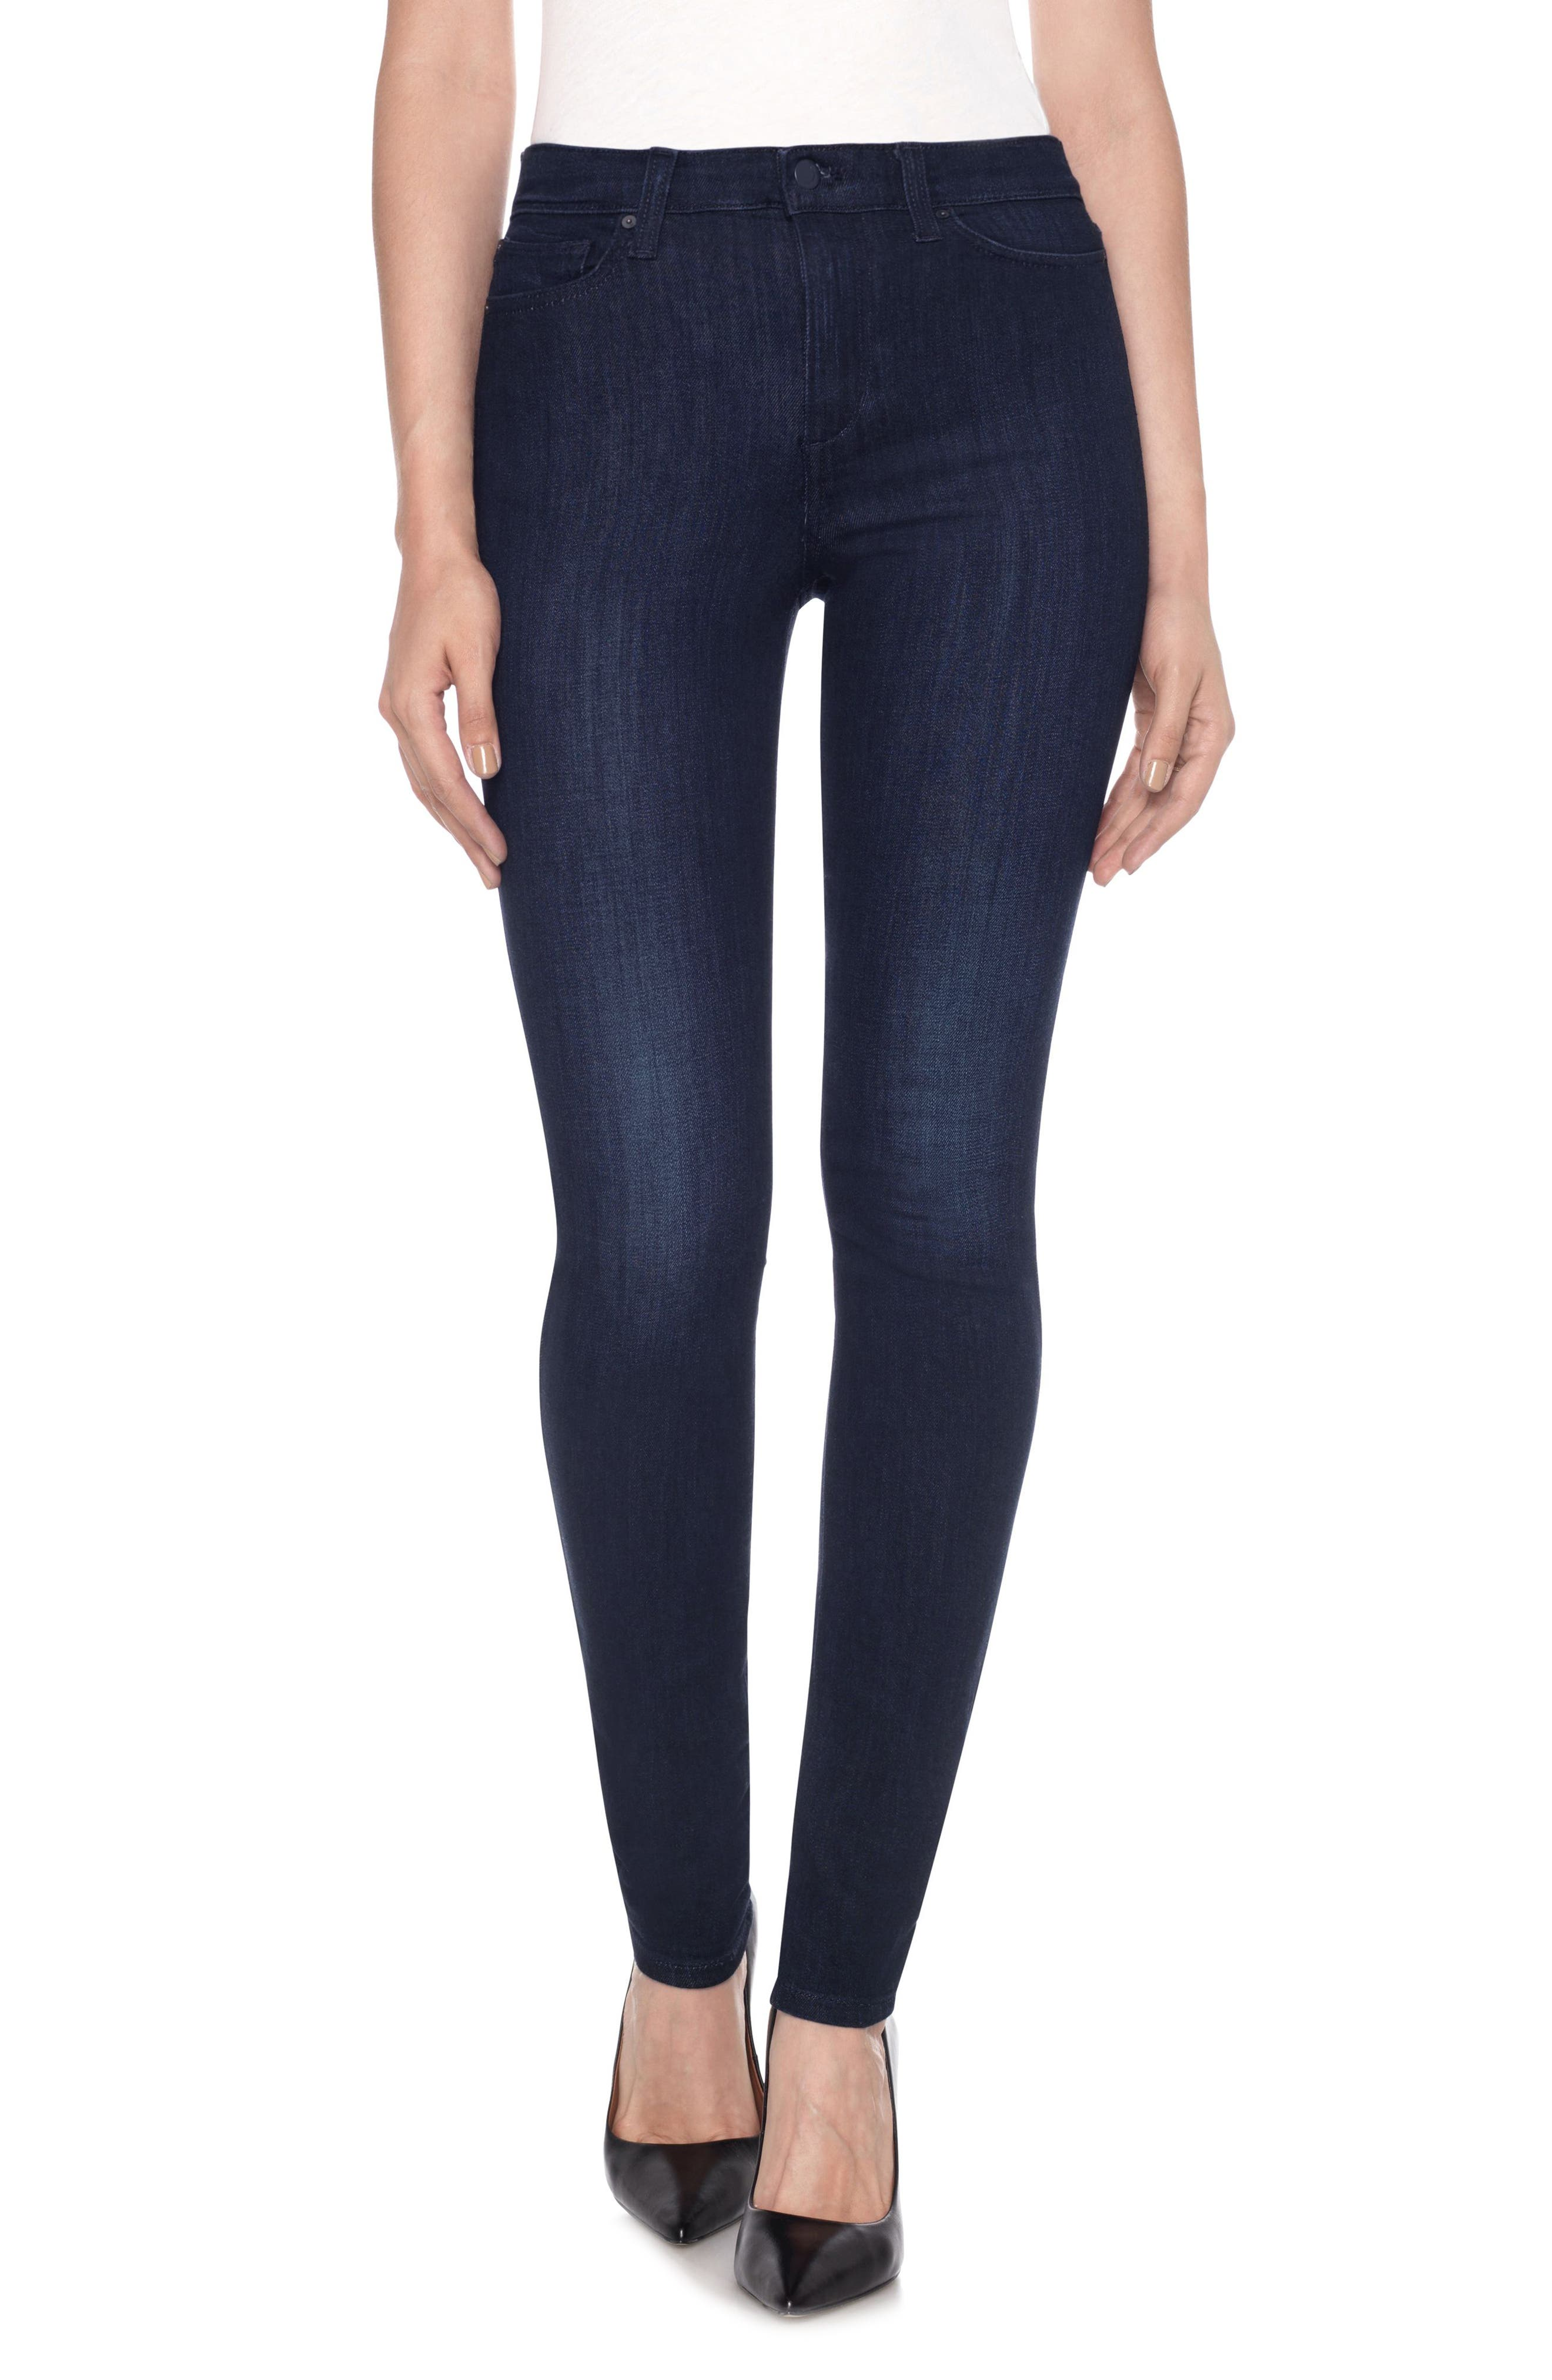 Alternate Image 1 Selected - Joe's Charlie High Waist Skinny Jeans (Arden)